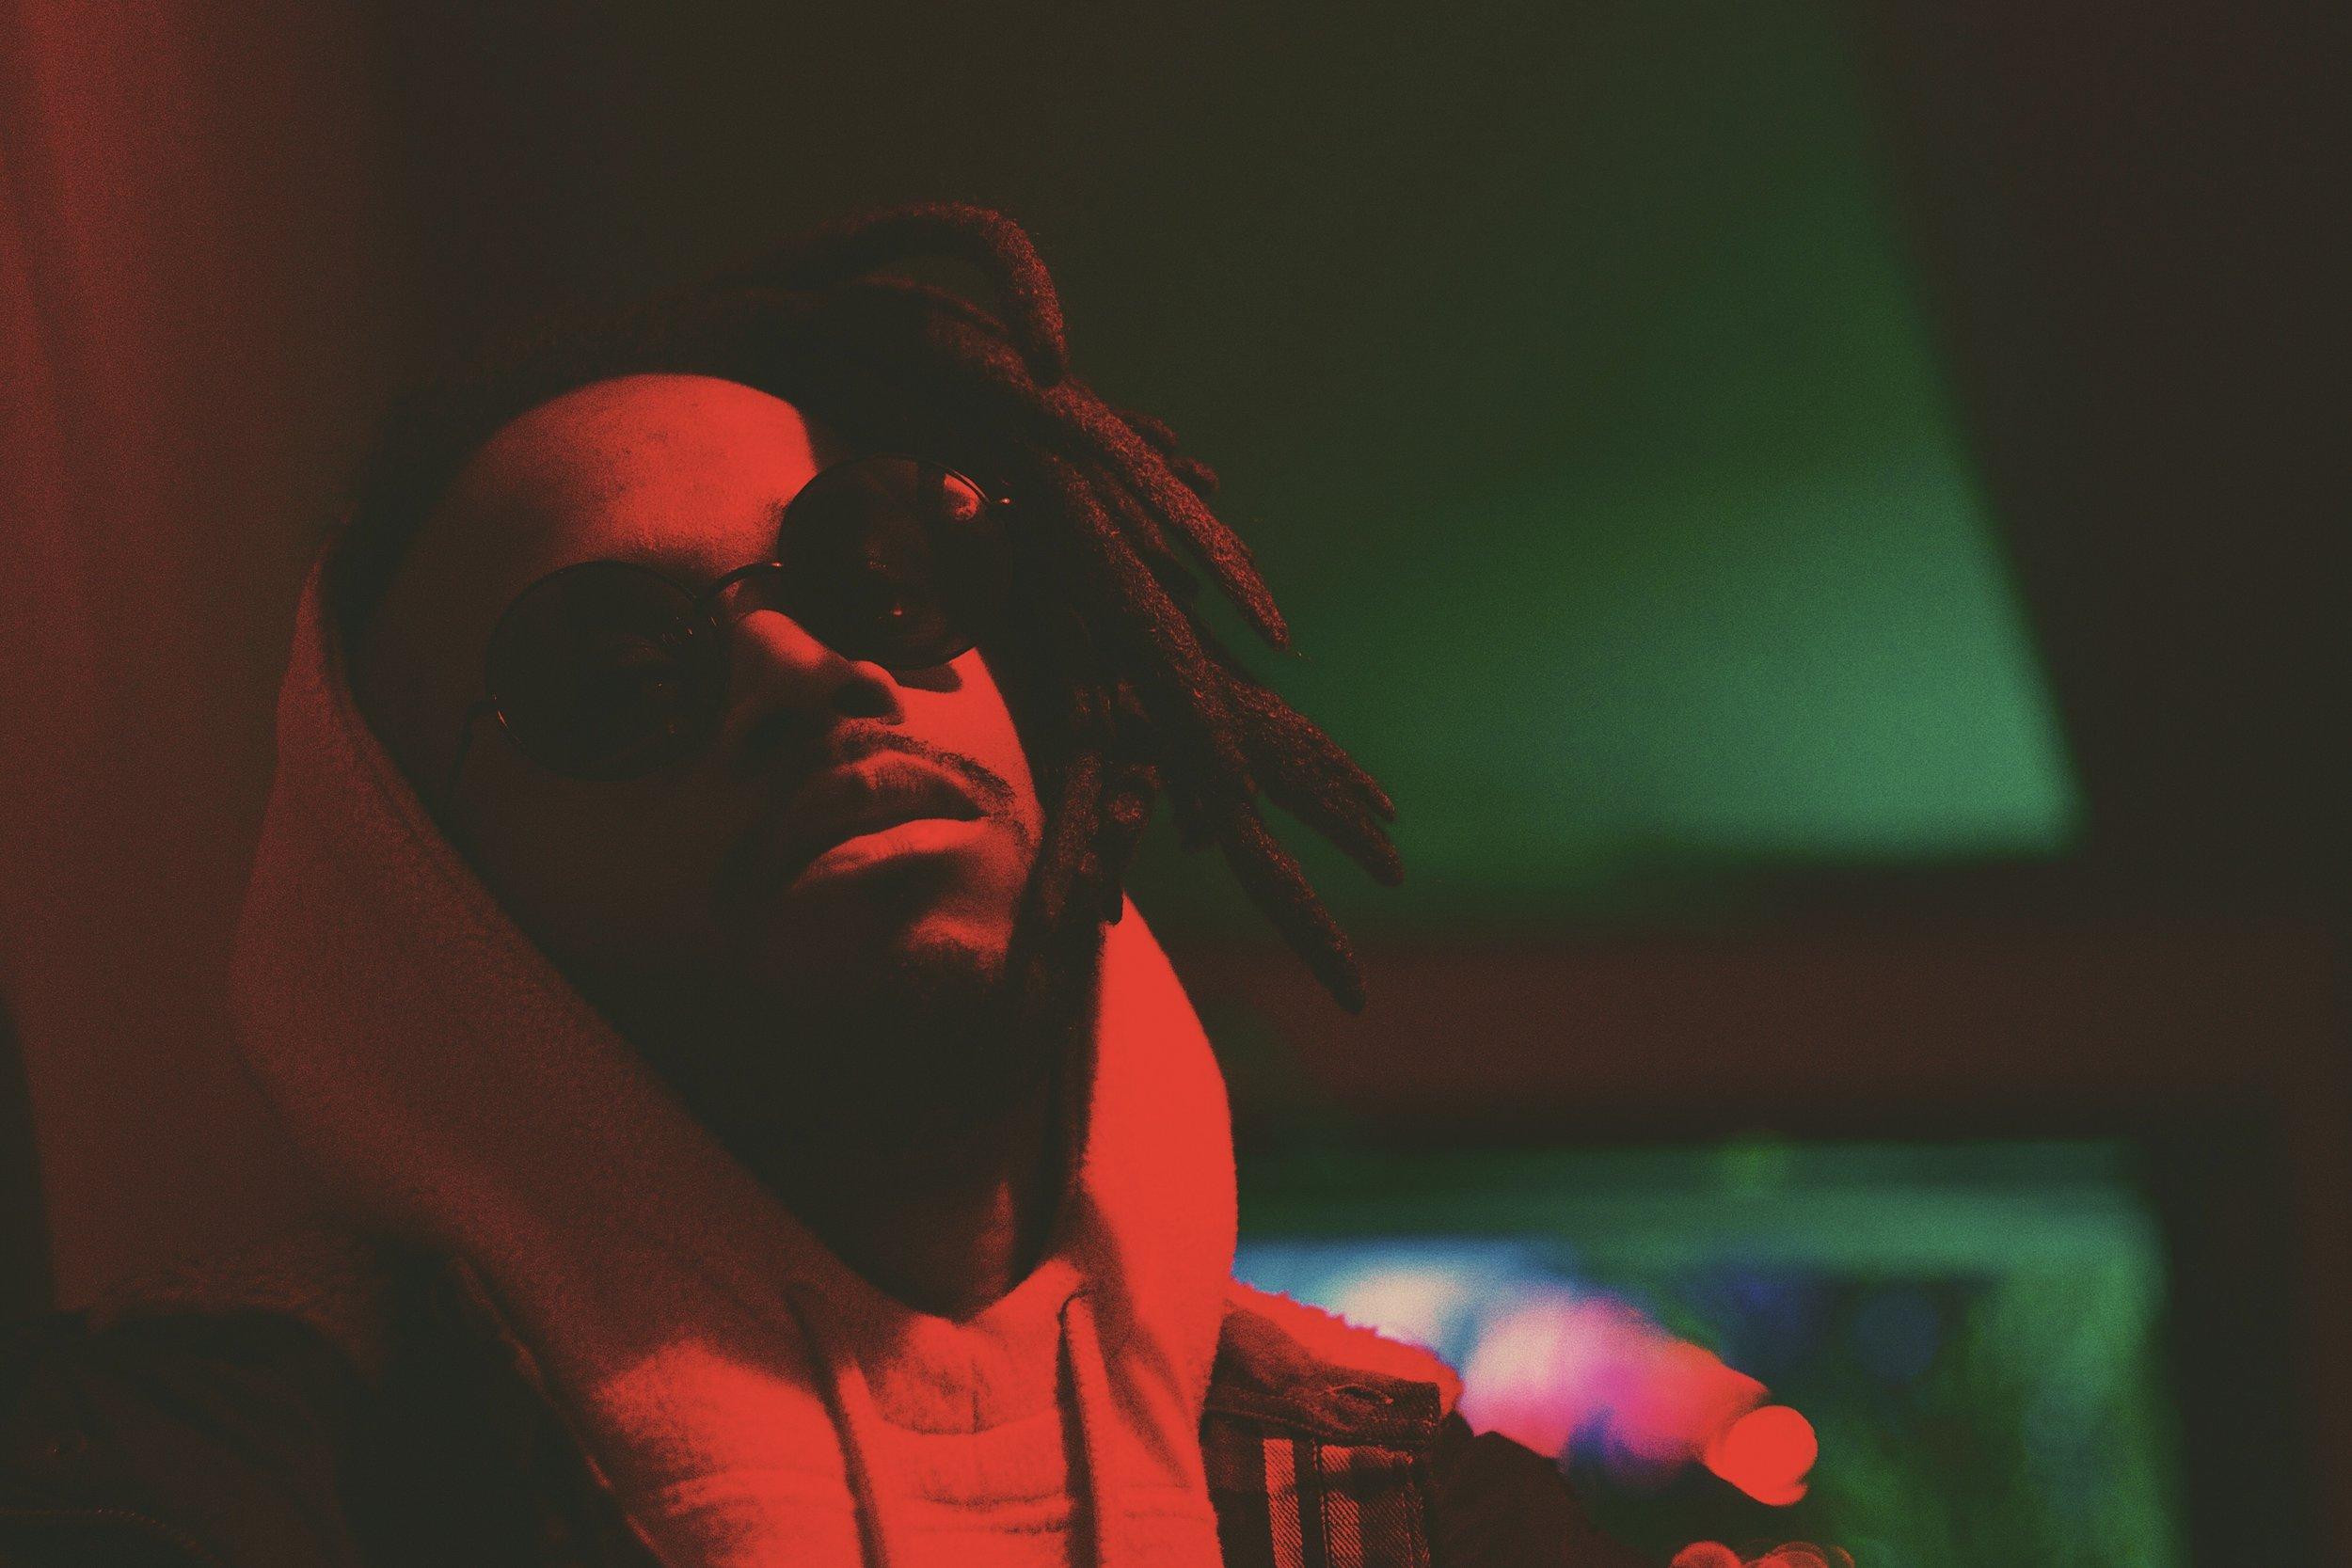 KEYZ VANGO - R&B & Alternative